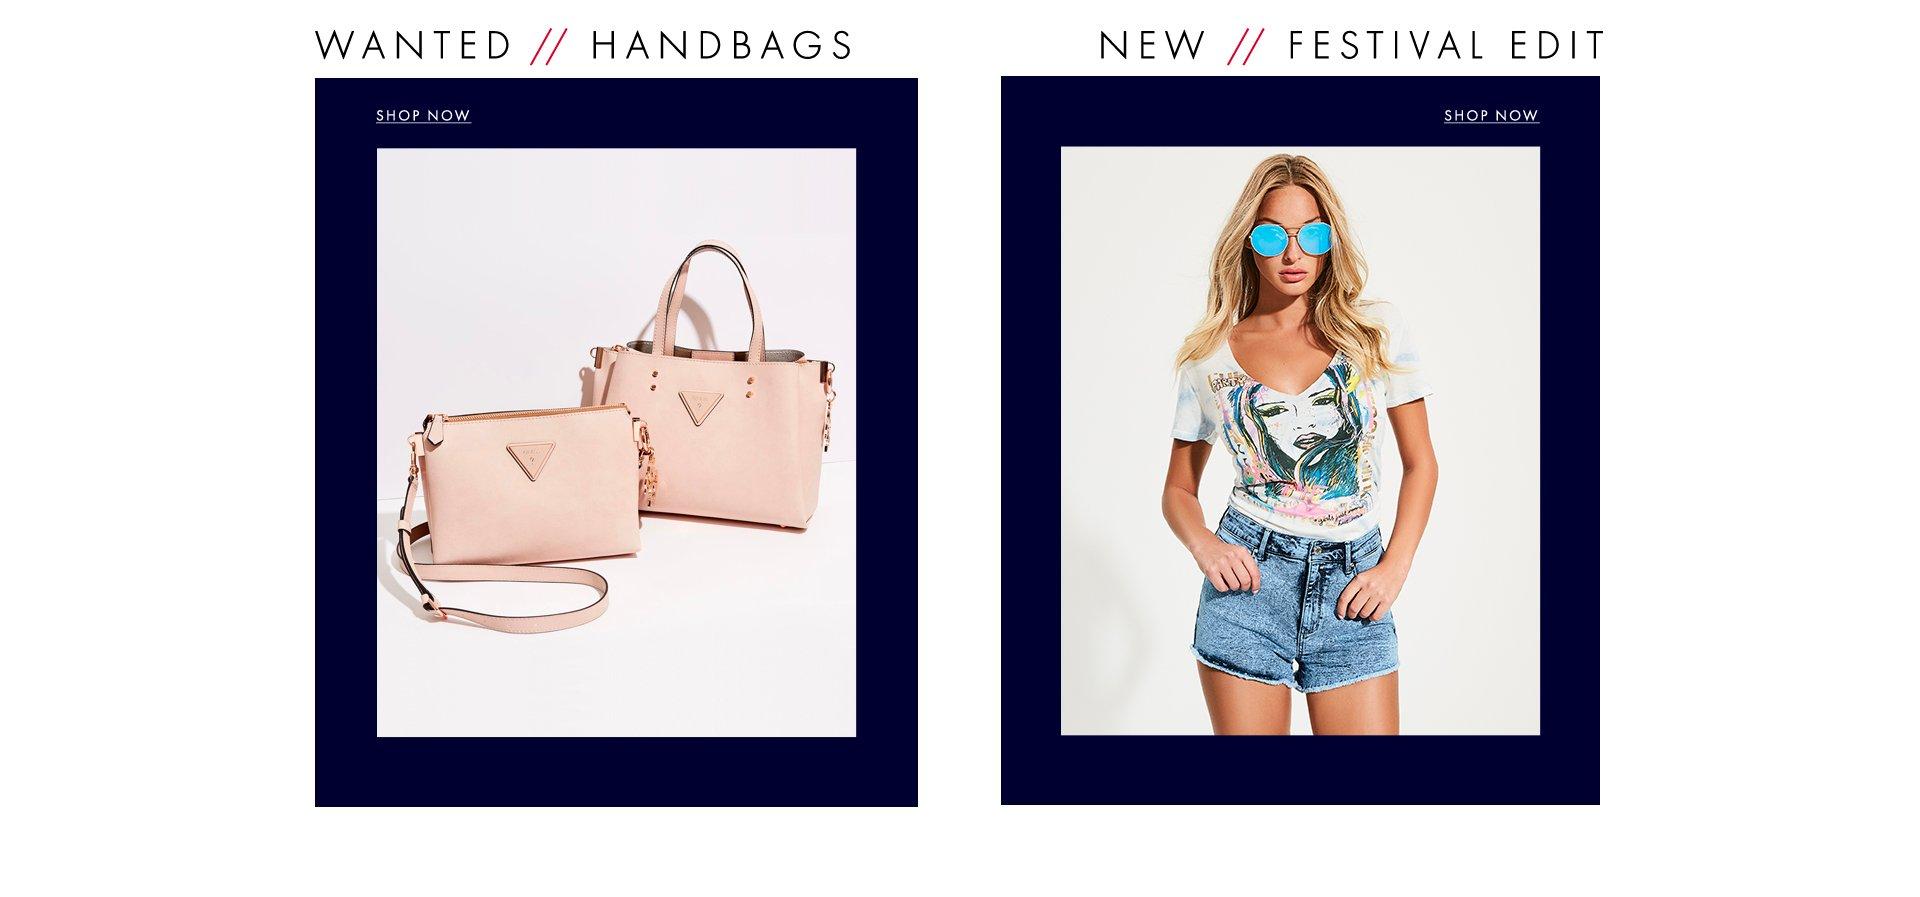 Handbags and Festival Edit